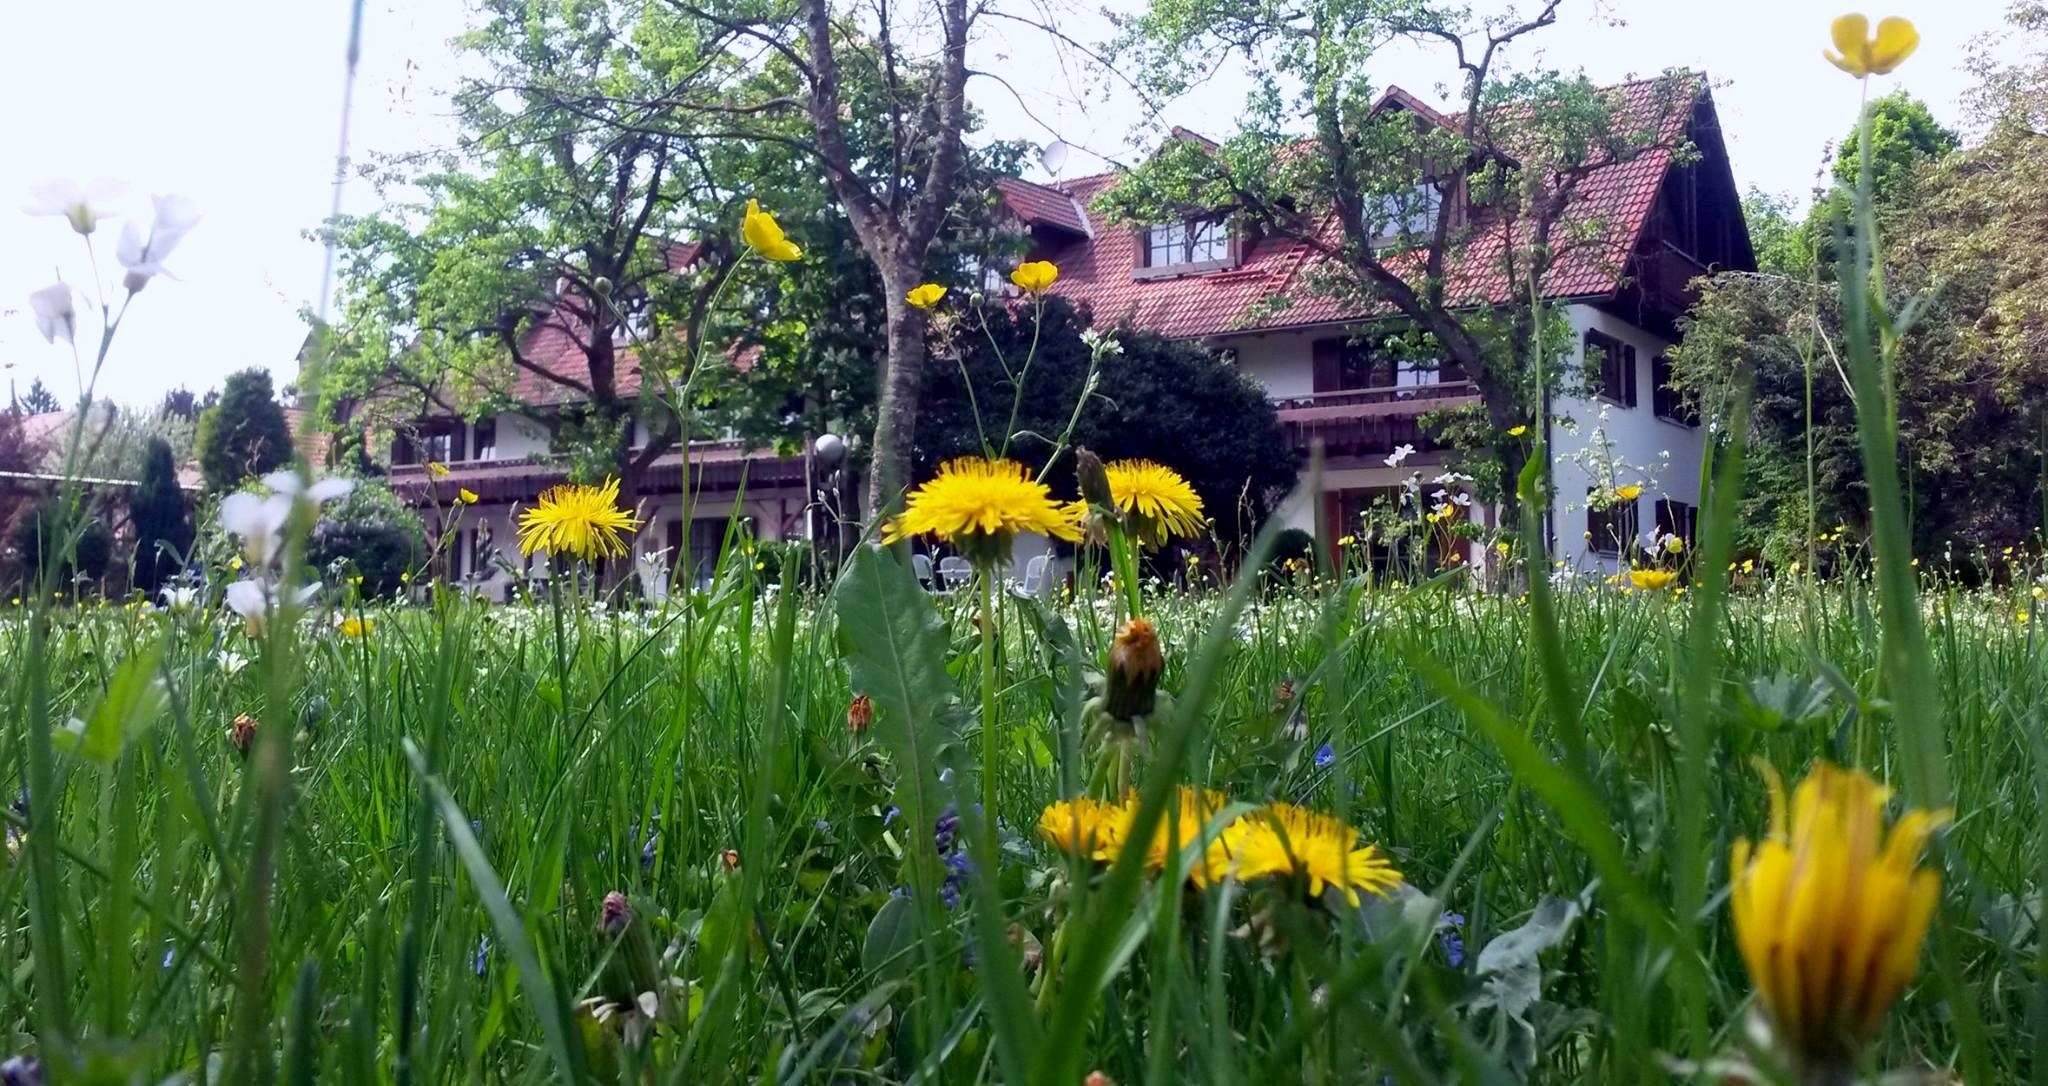 Garten im Frühling_bearbeitet